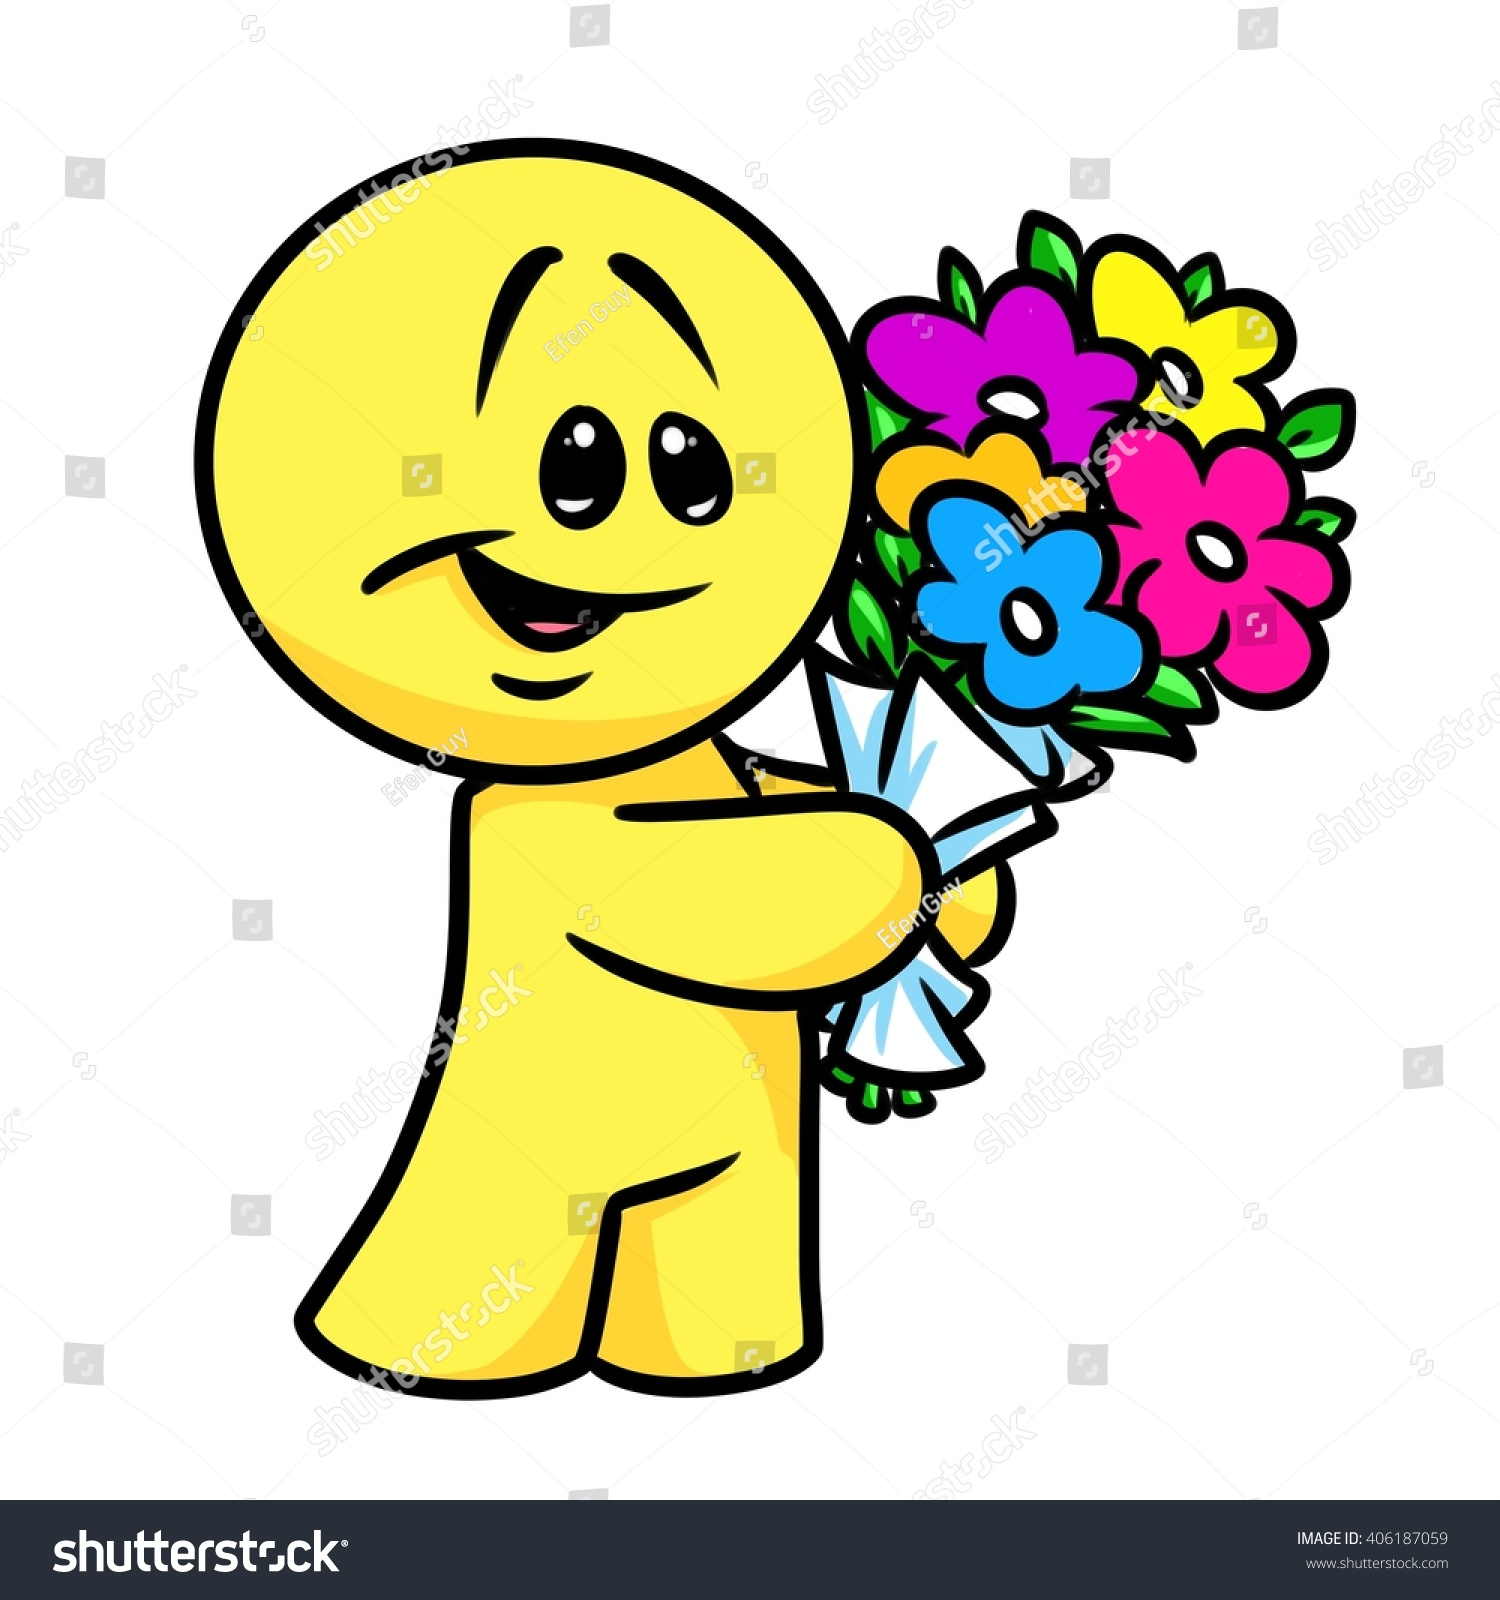 Smiley character bouquet flowers cartoon illustration stock smiley character bouquet flowers cartoon illustration isolated image izmirmasajfo